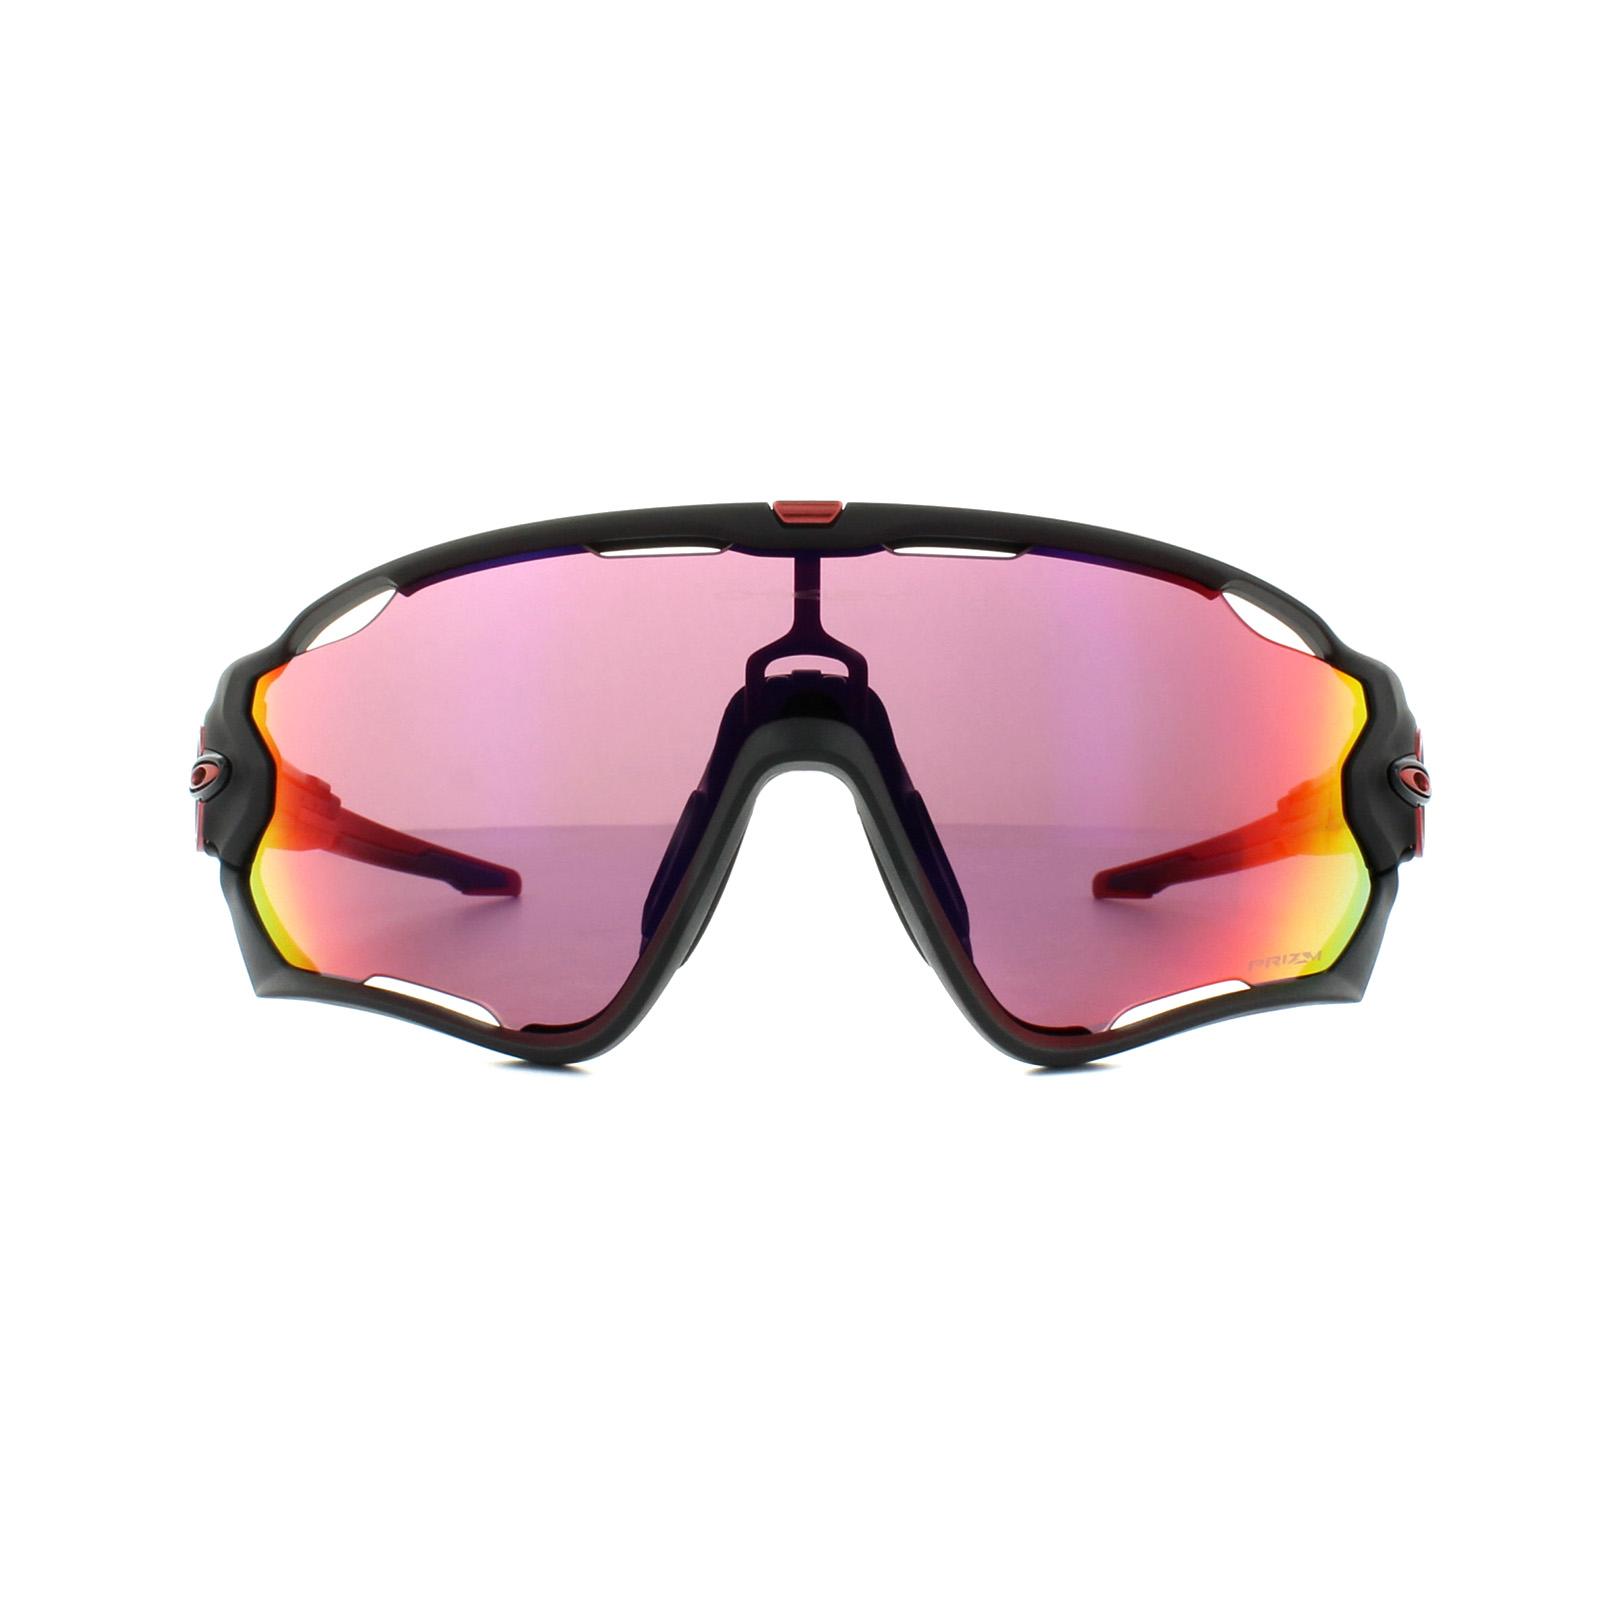 Sol Jawbreaker Oo9290 Oakley Gafas Negro Road 20 Prizm Detalles Mate De fy7m6bvIYg